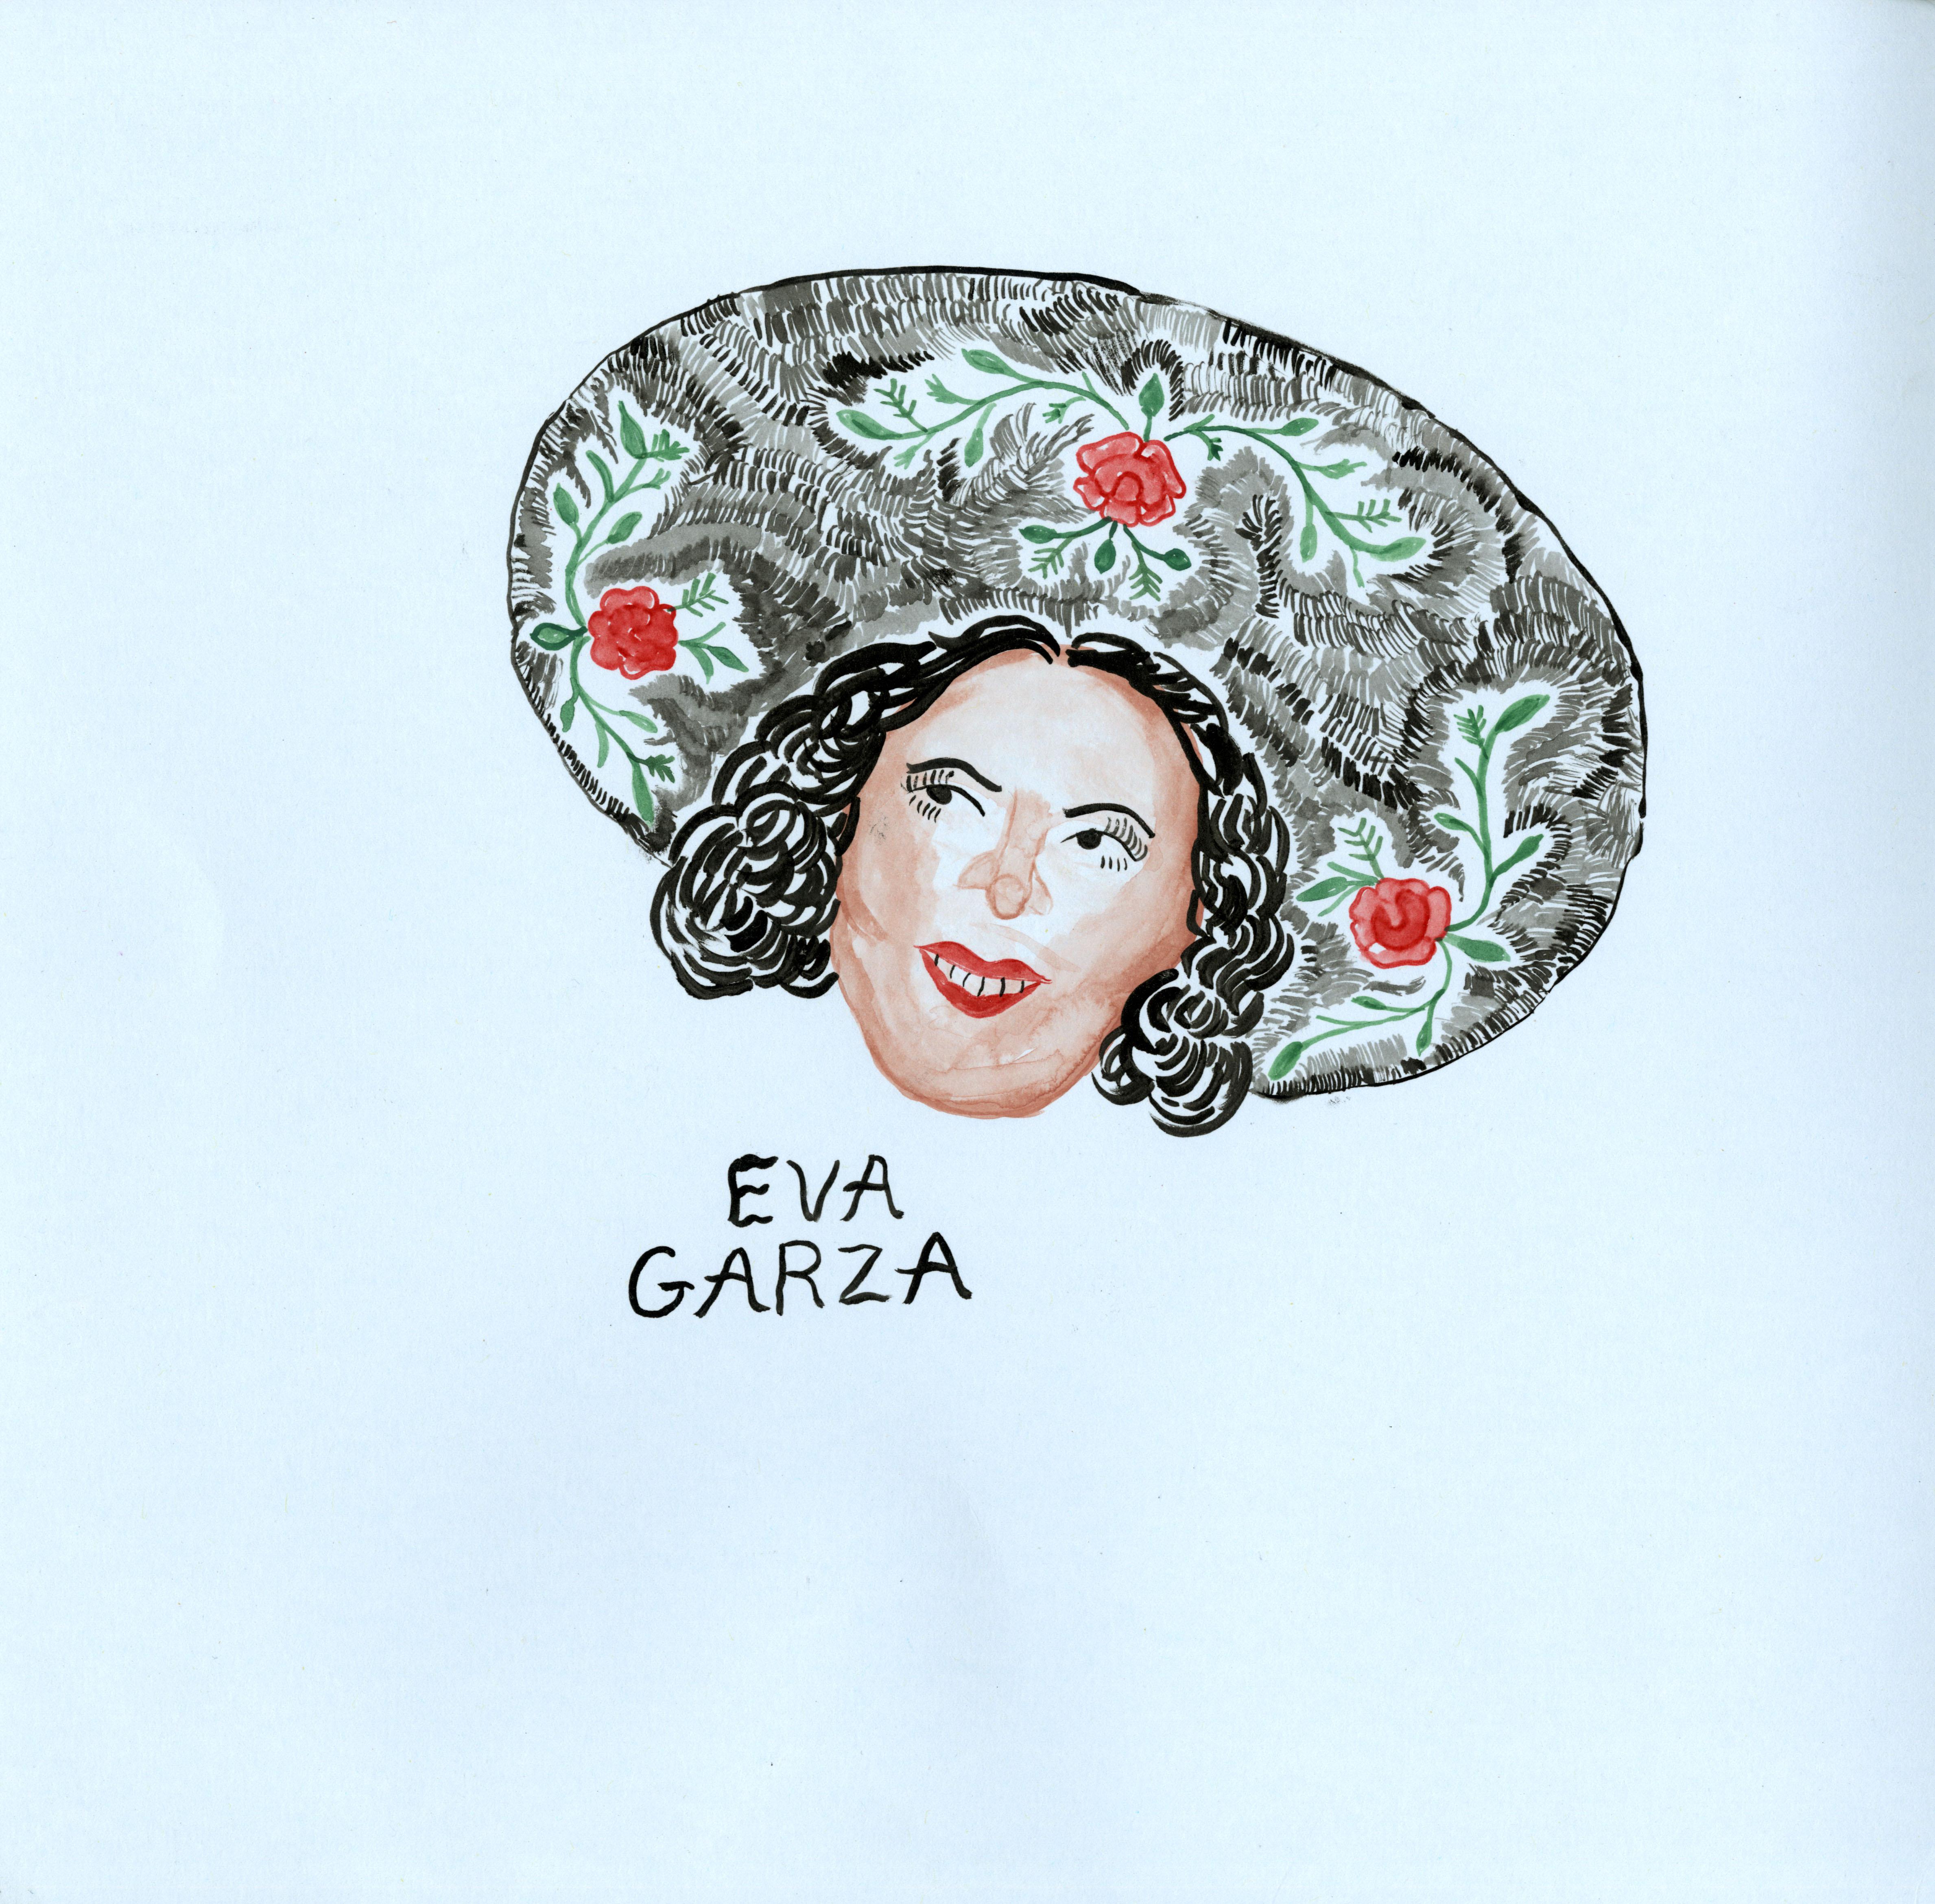 Eva Garza Final